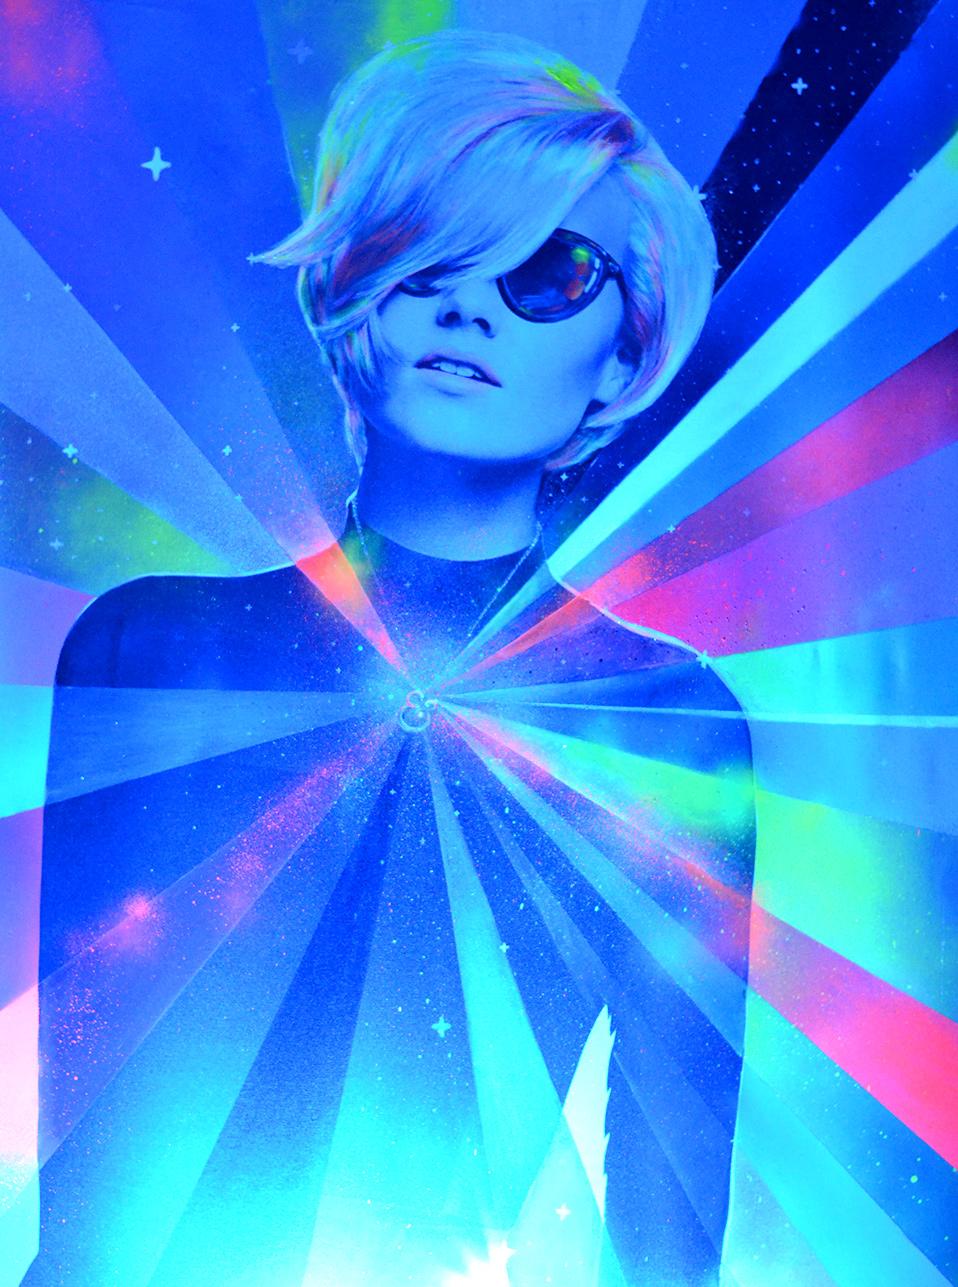 Neon Lady by Eduardo Morales